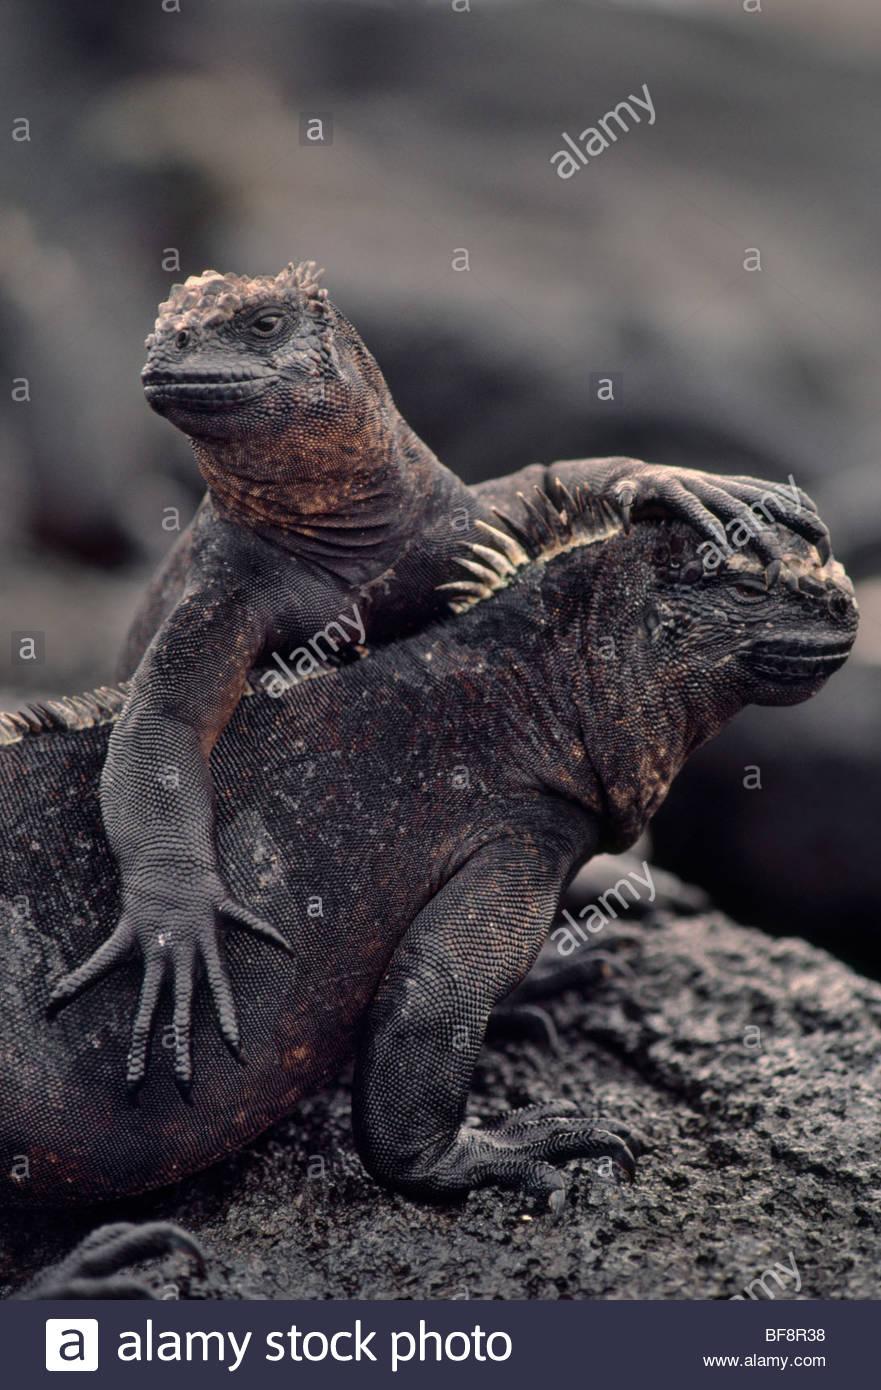 Iguane marin Amblyrhynchus cristatus, paire, Îles Galápagos Photo Stock